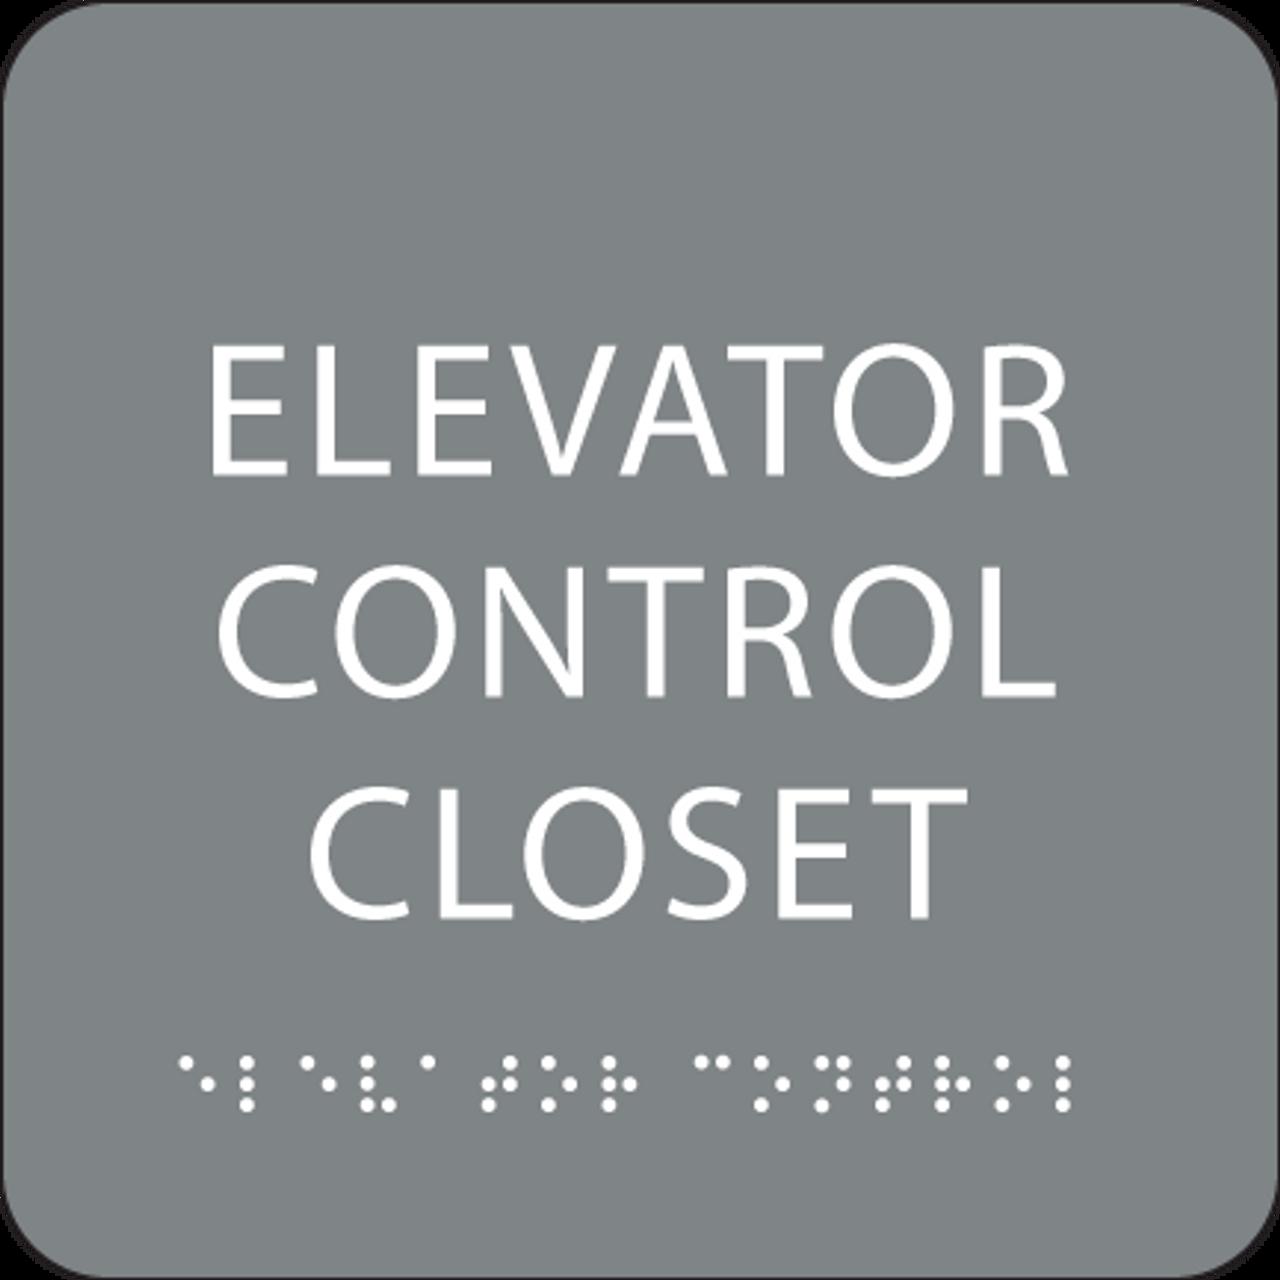 Grey Elevator Control Closet ADA Sign